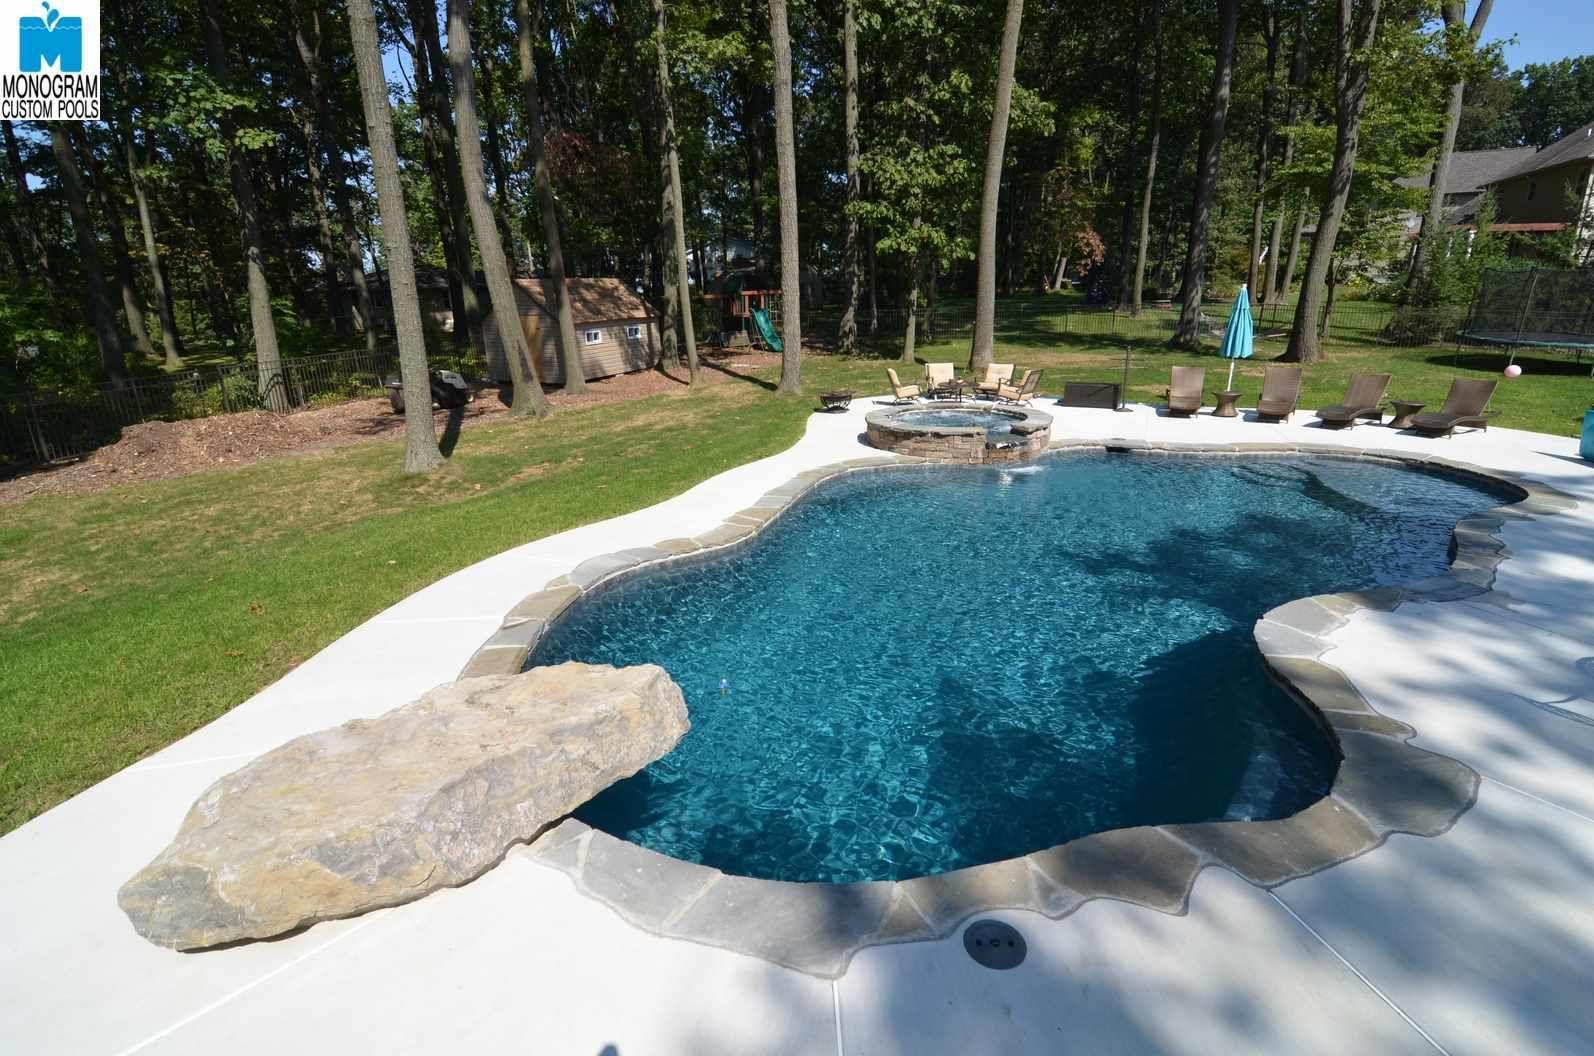 Bahama breeze pool plaster finishes pinterest bahama for Pool plaster